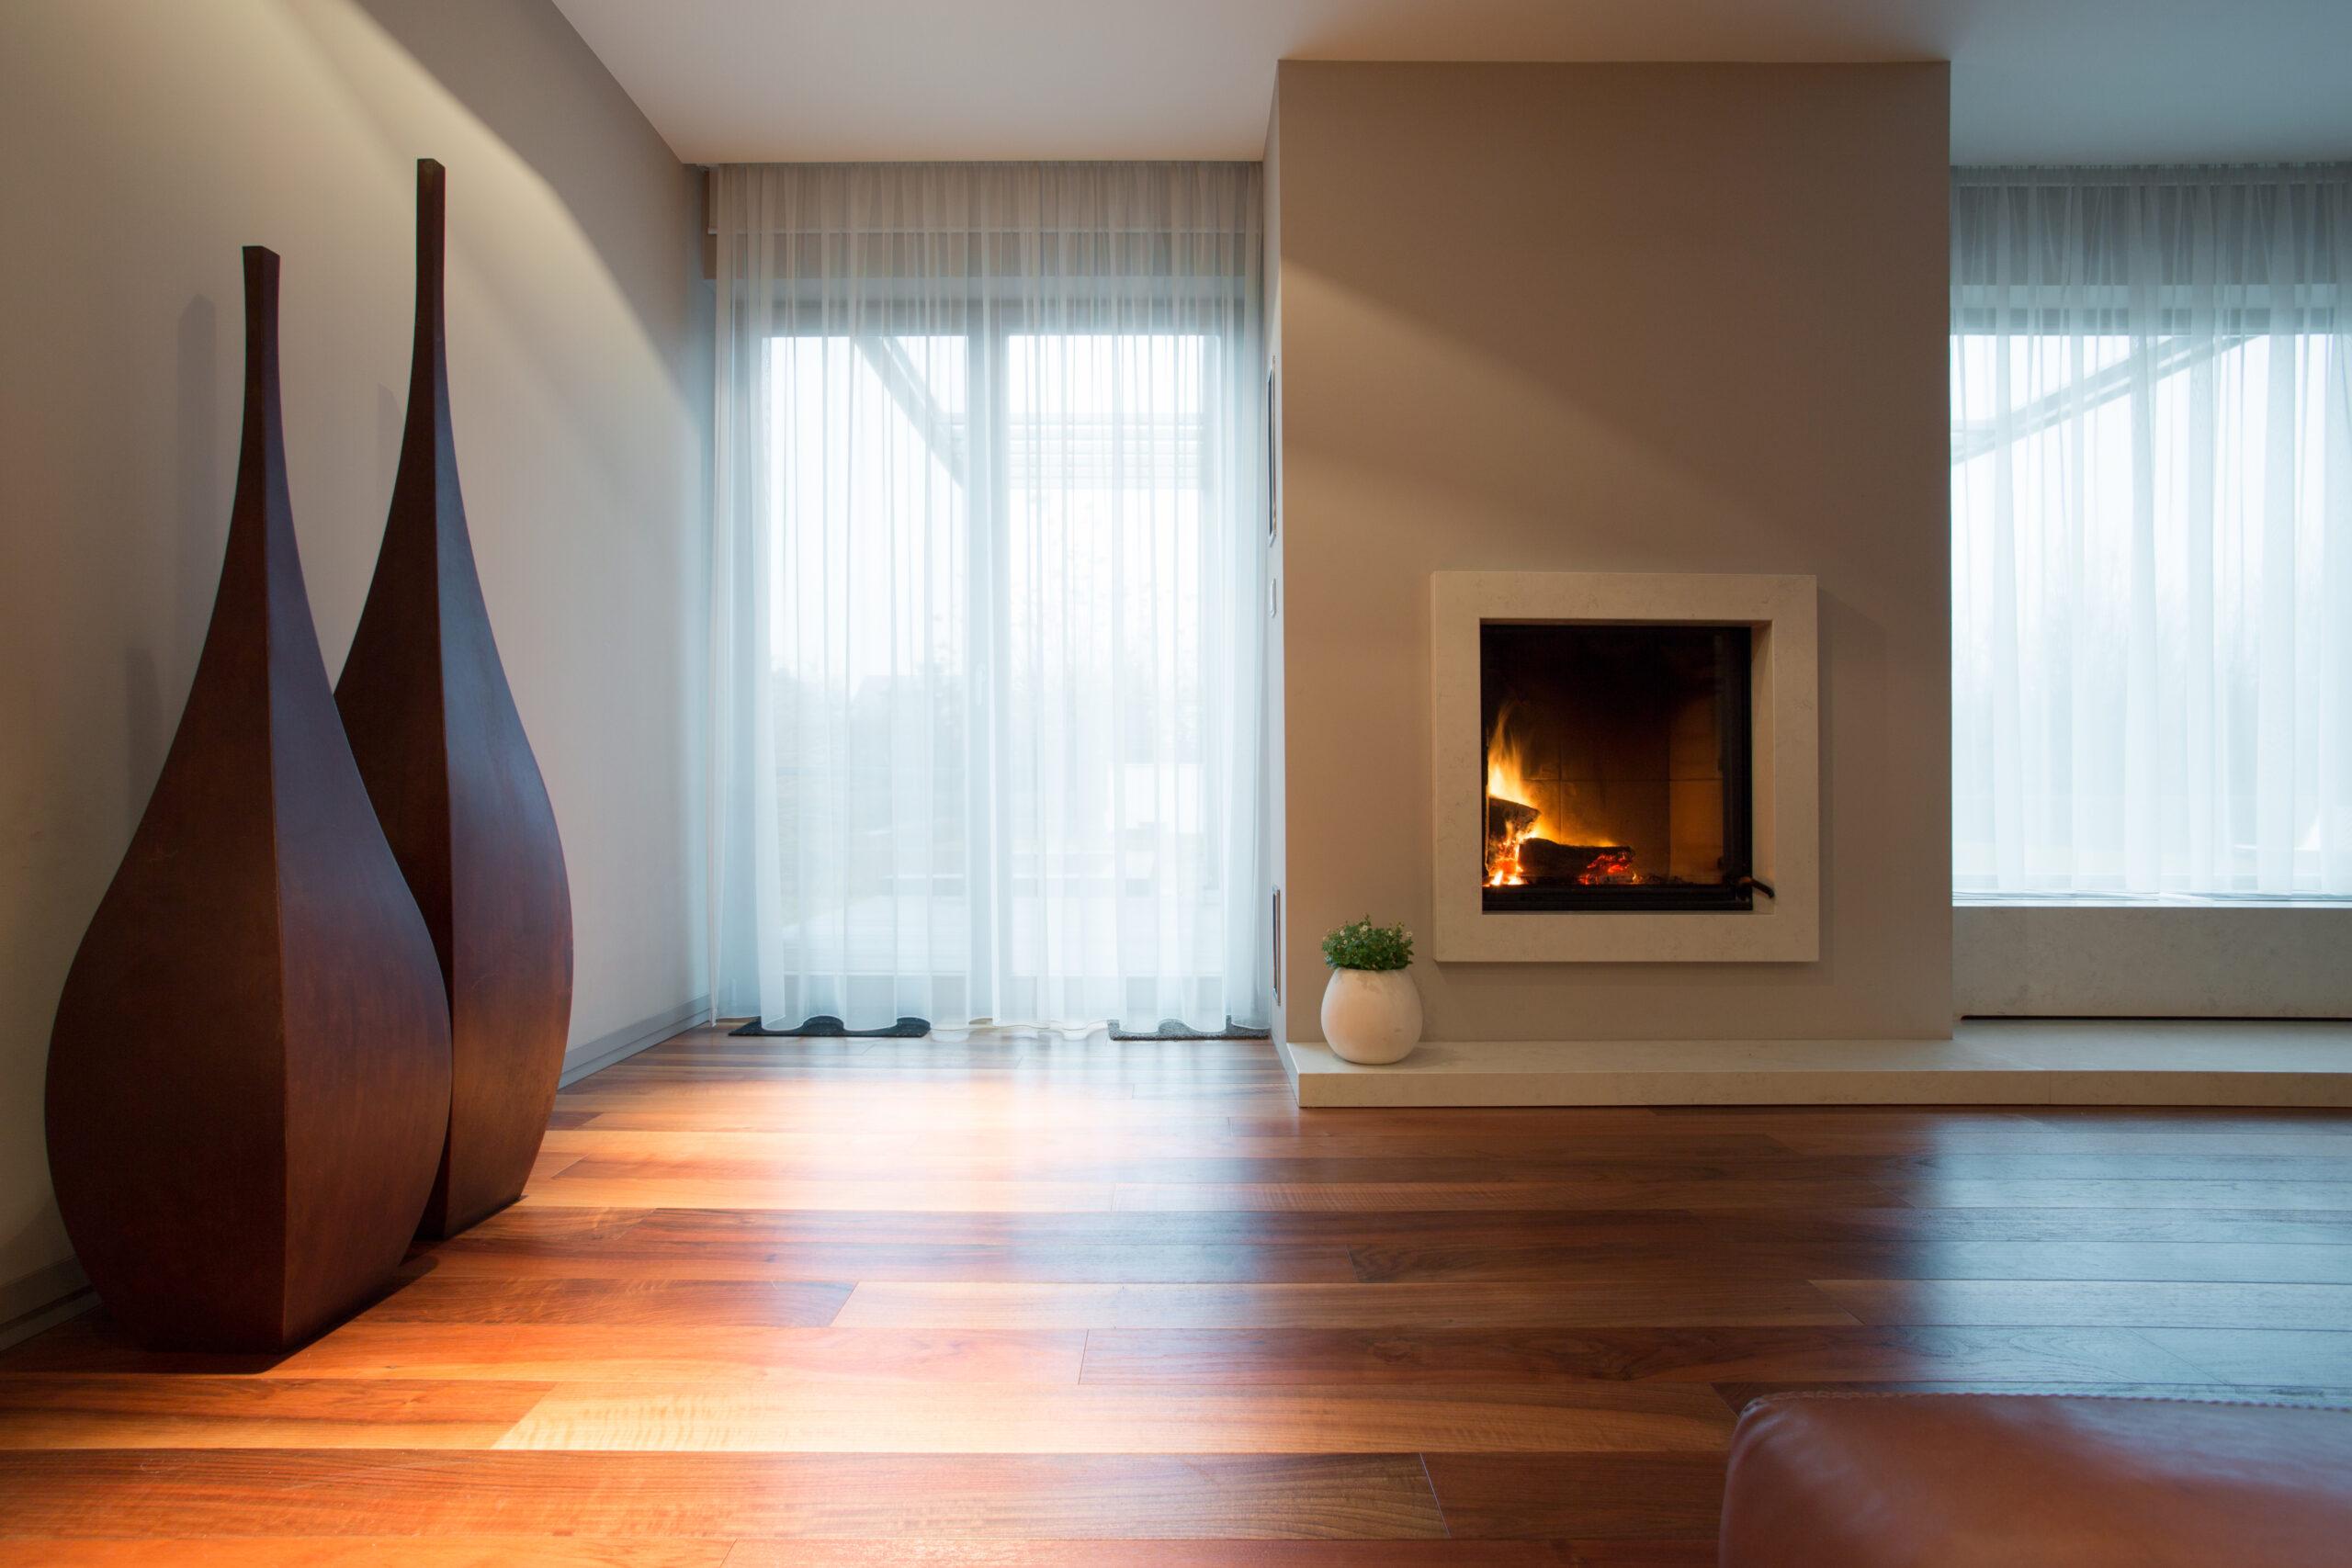 Warm cosy room photo